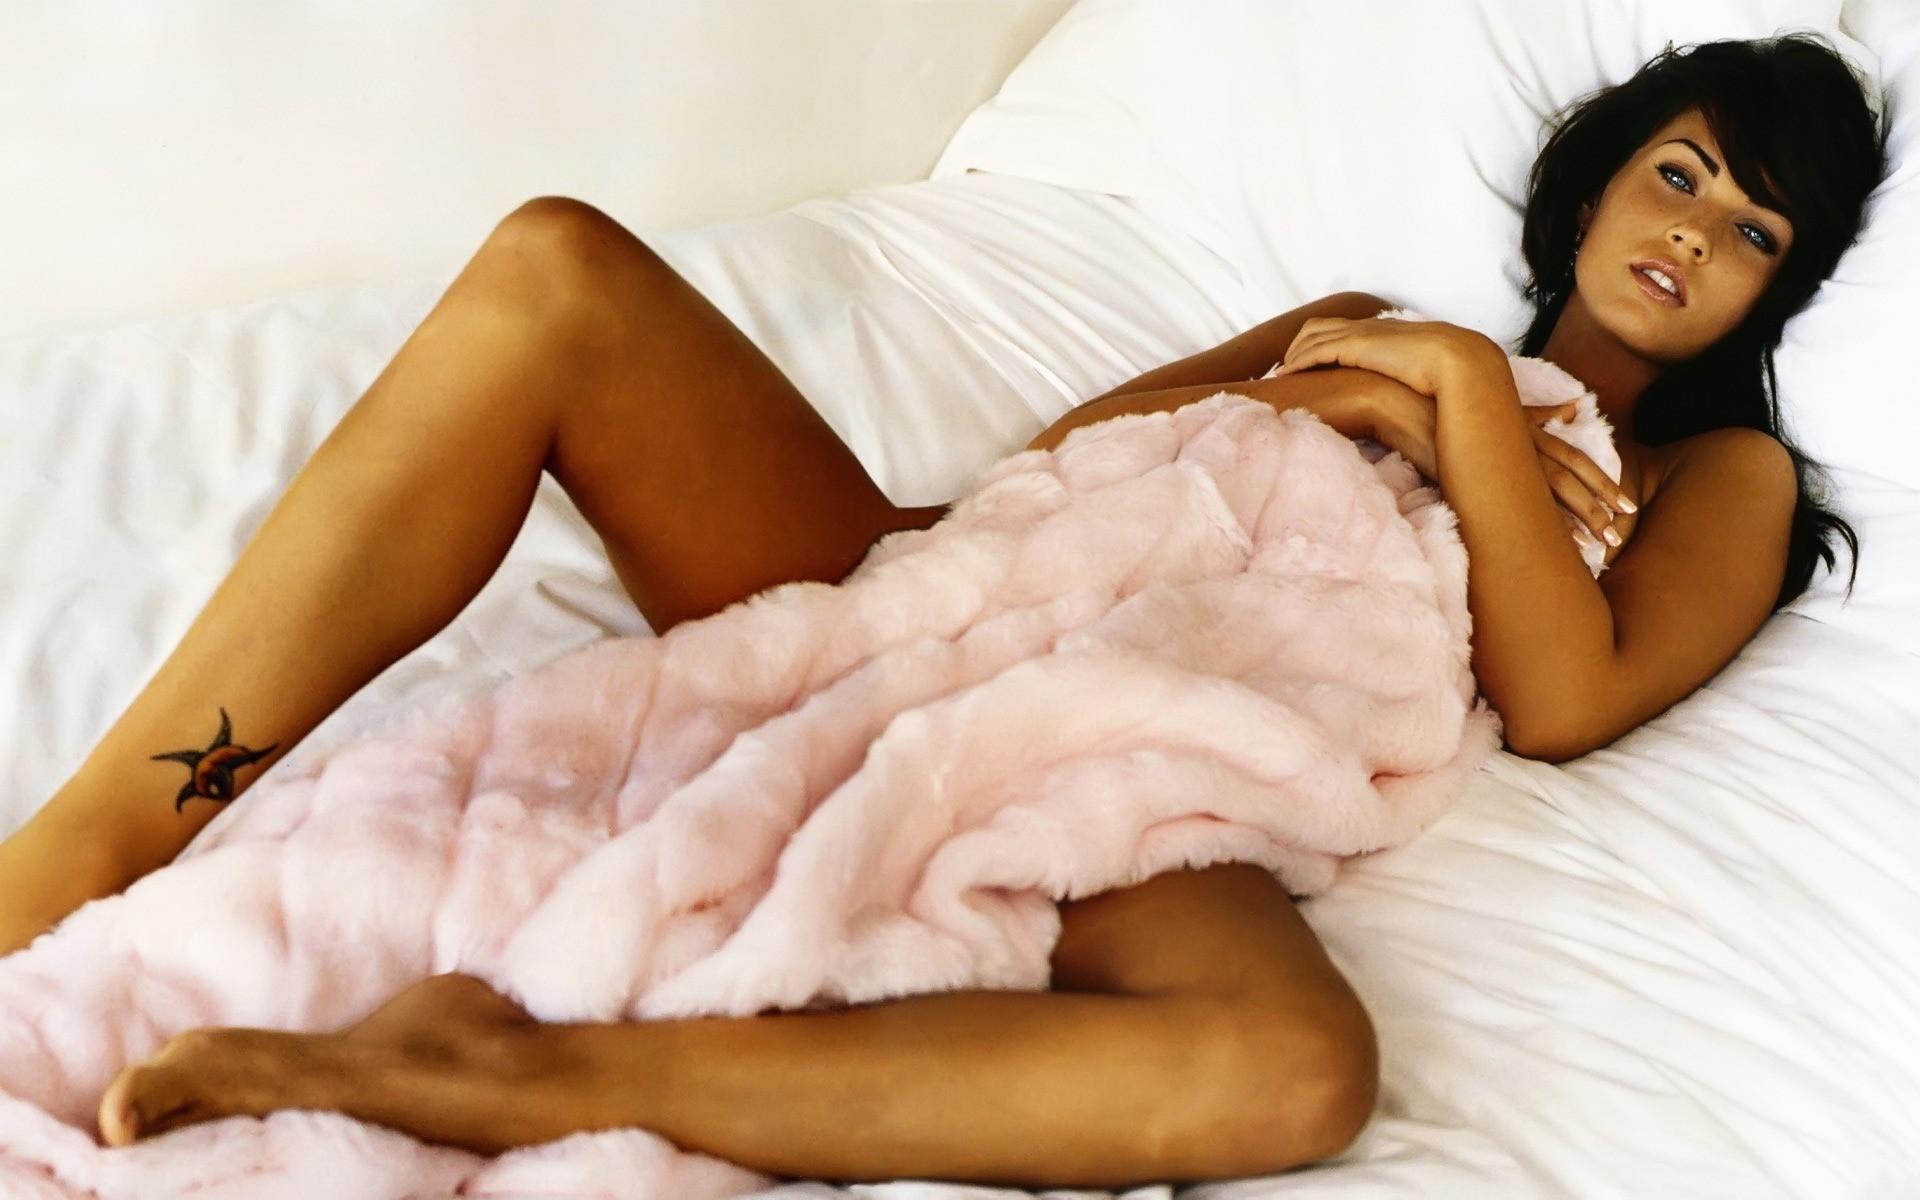 Картинки по запросу девушки в кровати